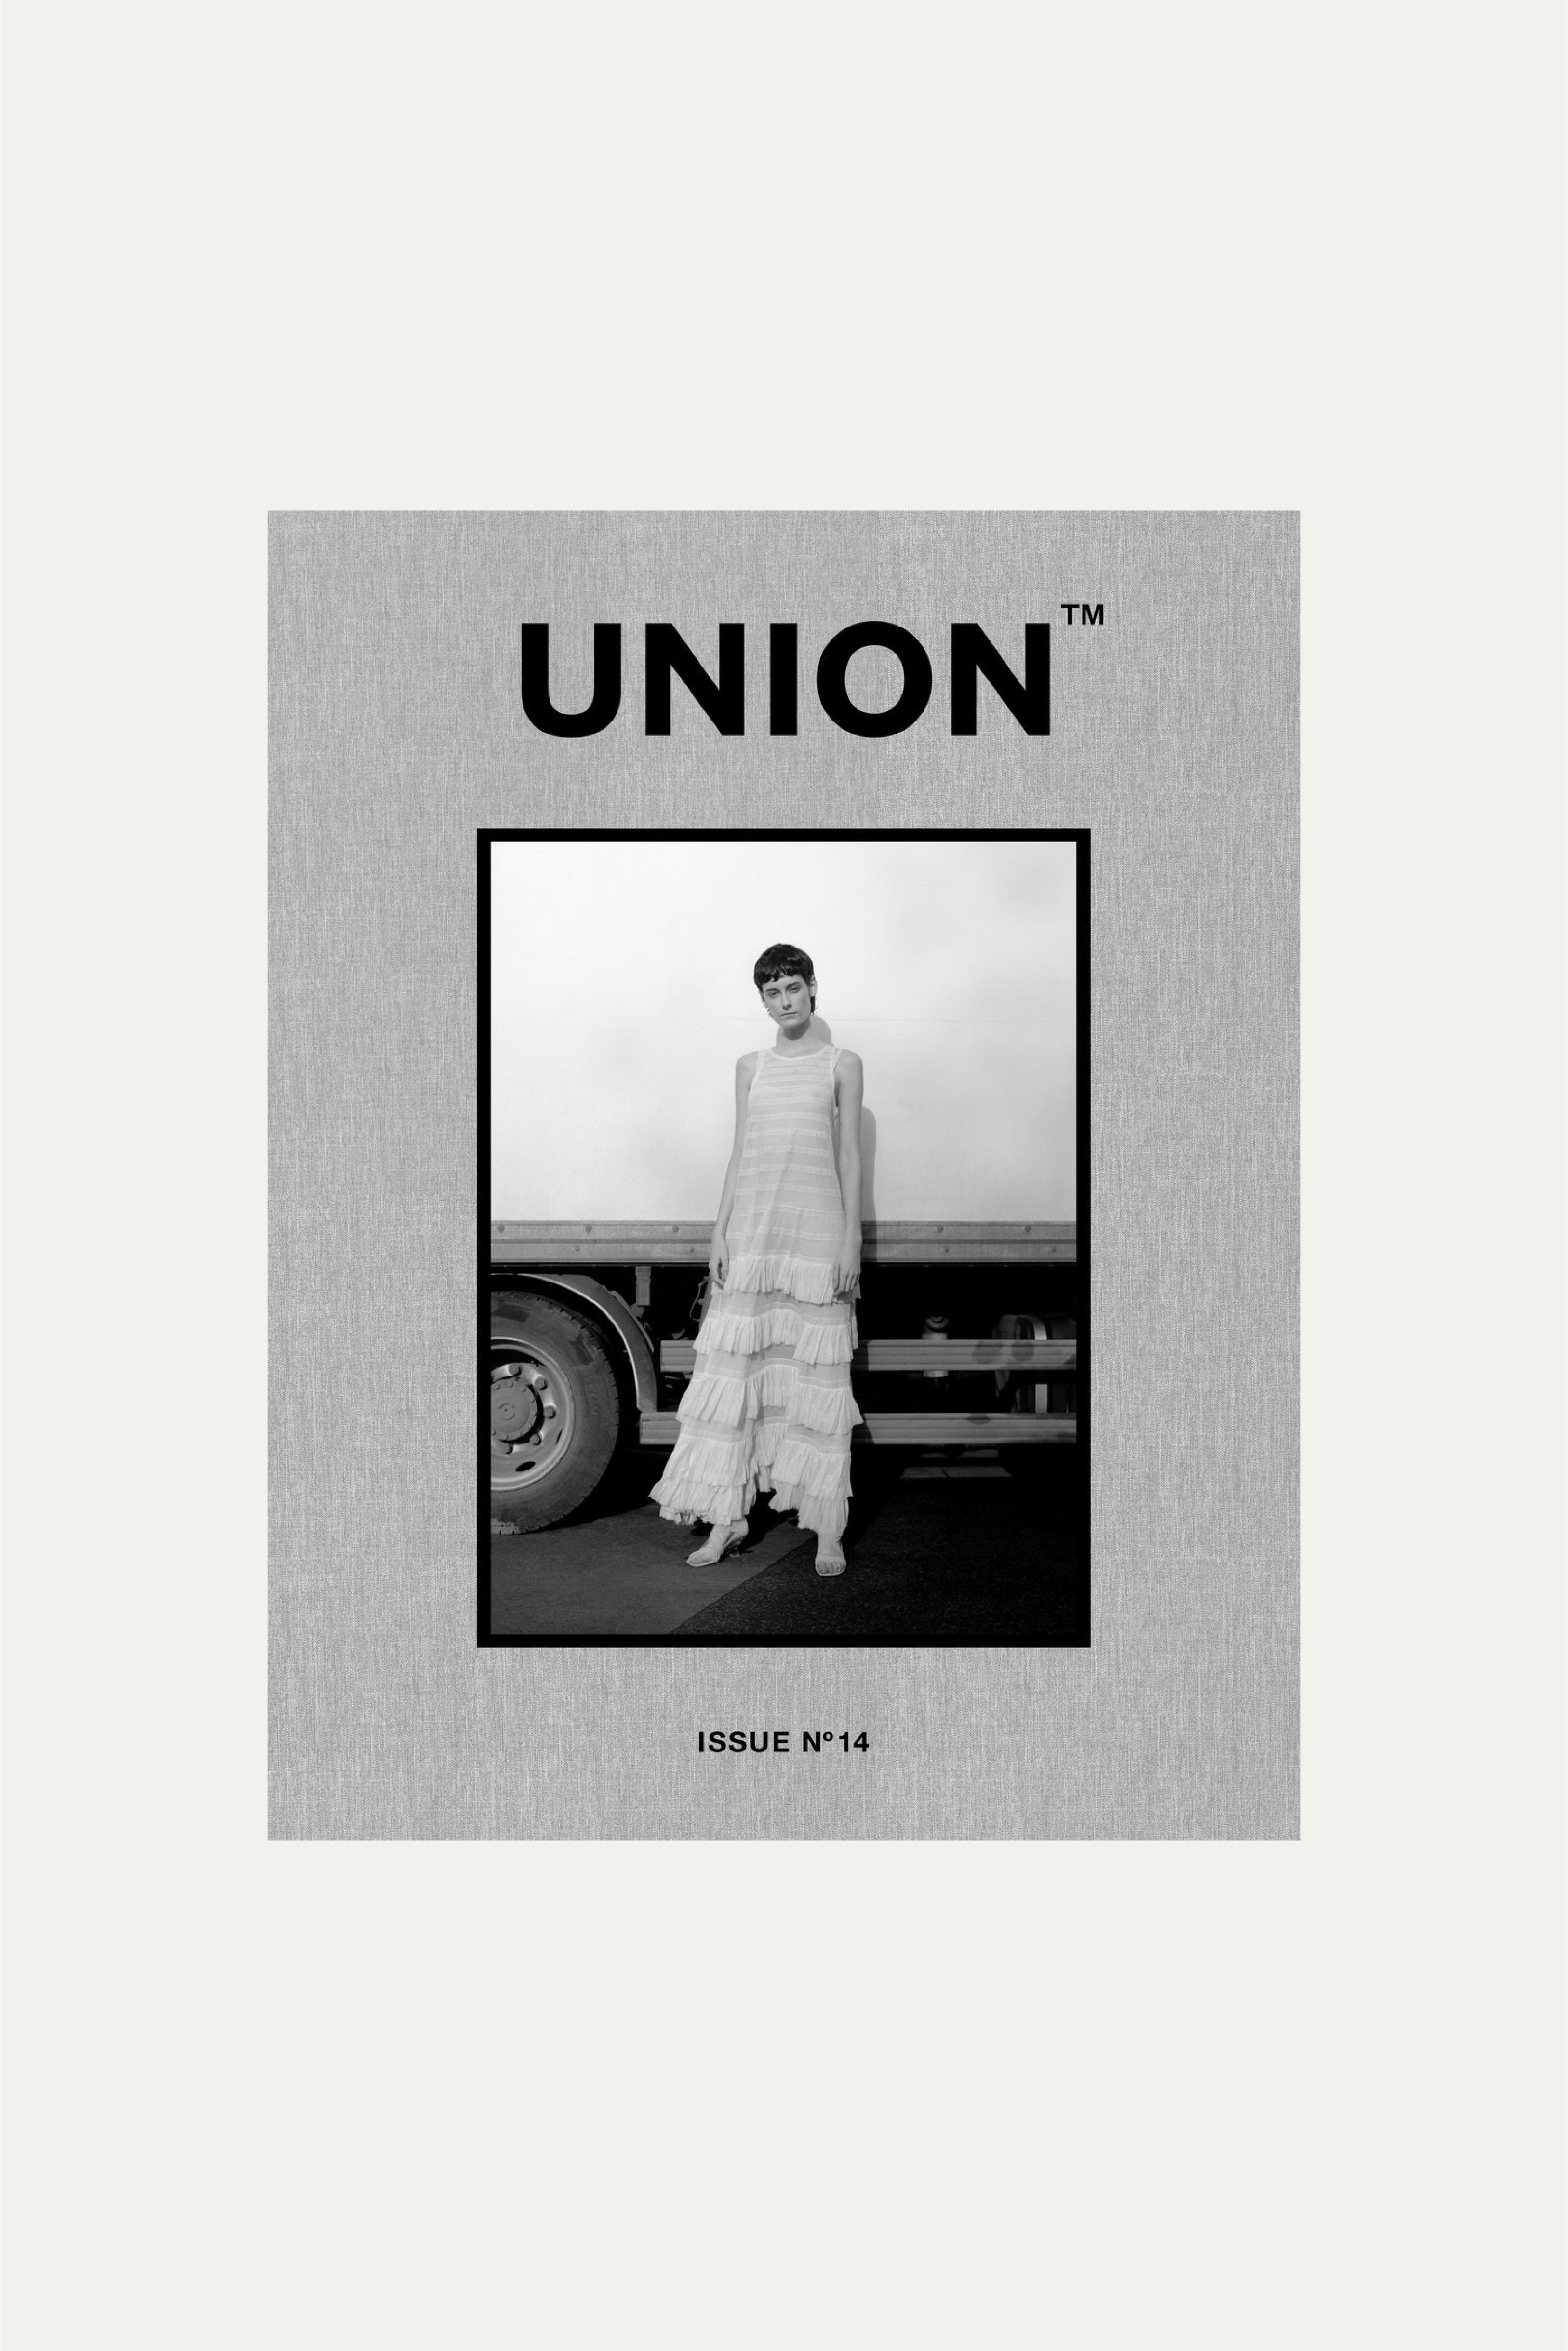 Union Vol 14